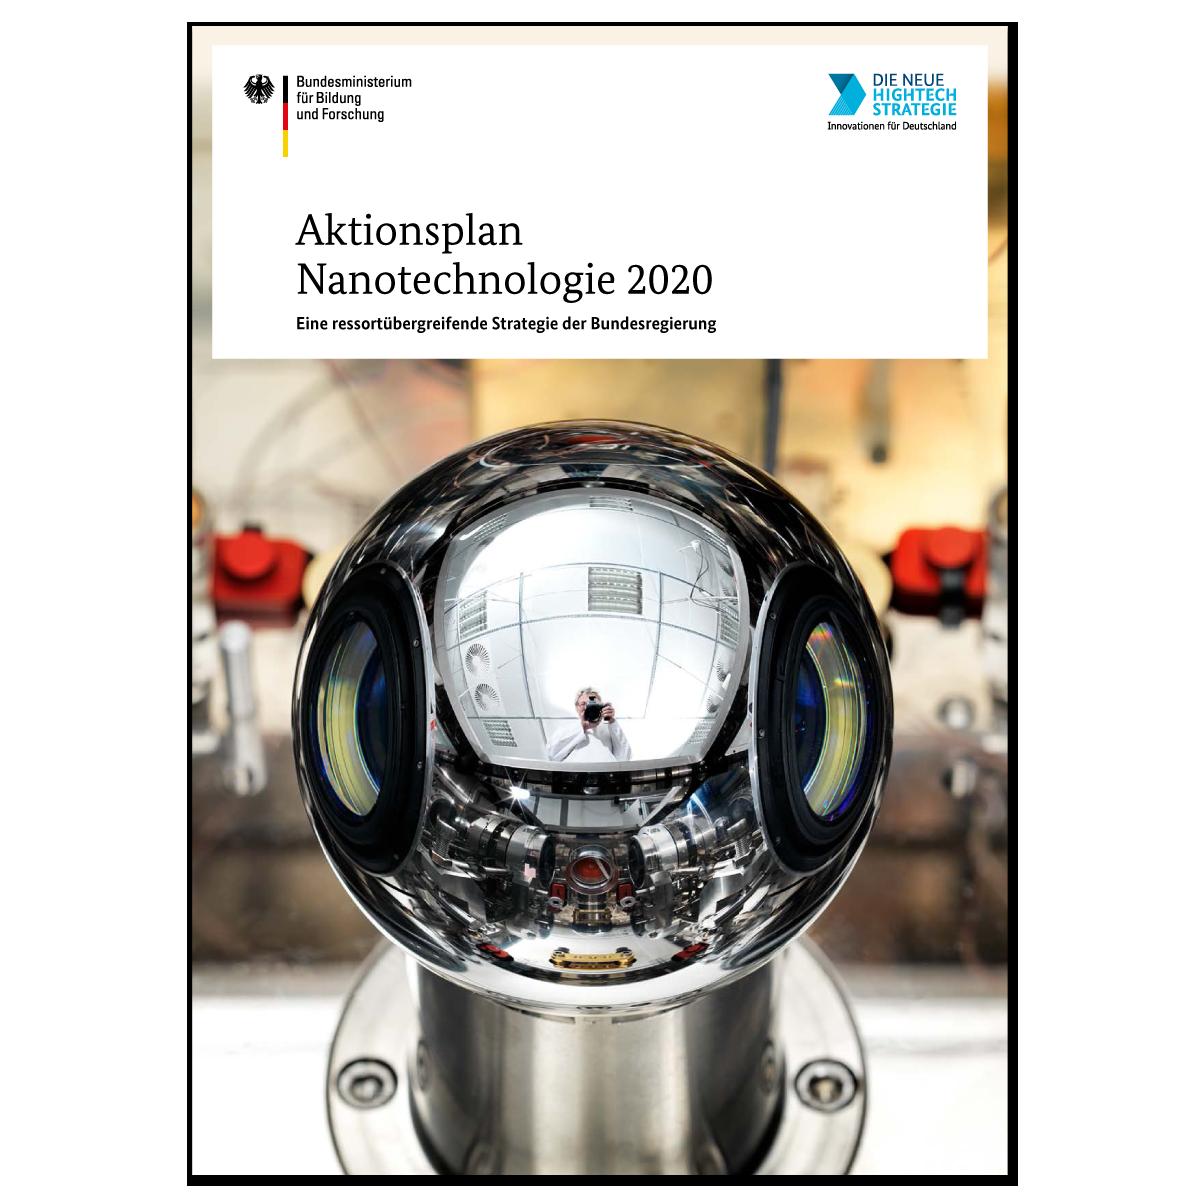 Aktionsplan Nanotechnologie 2020